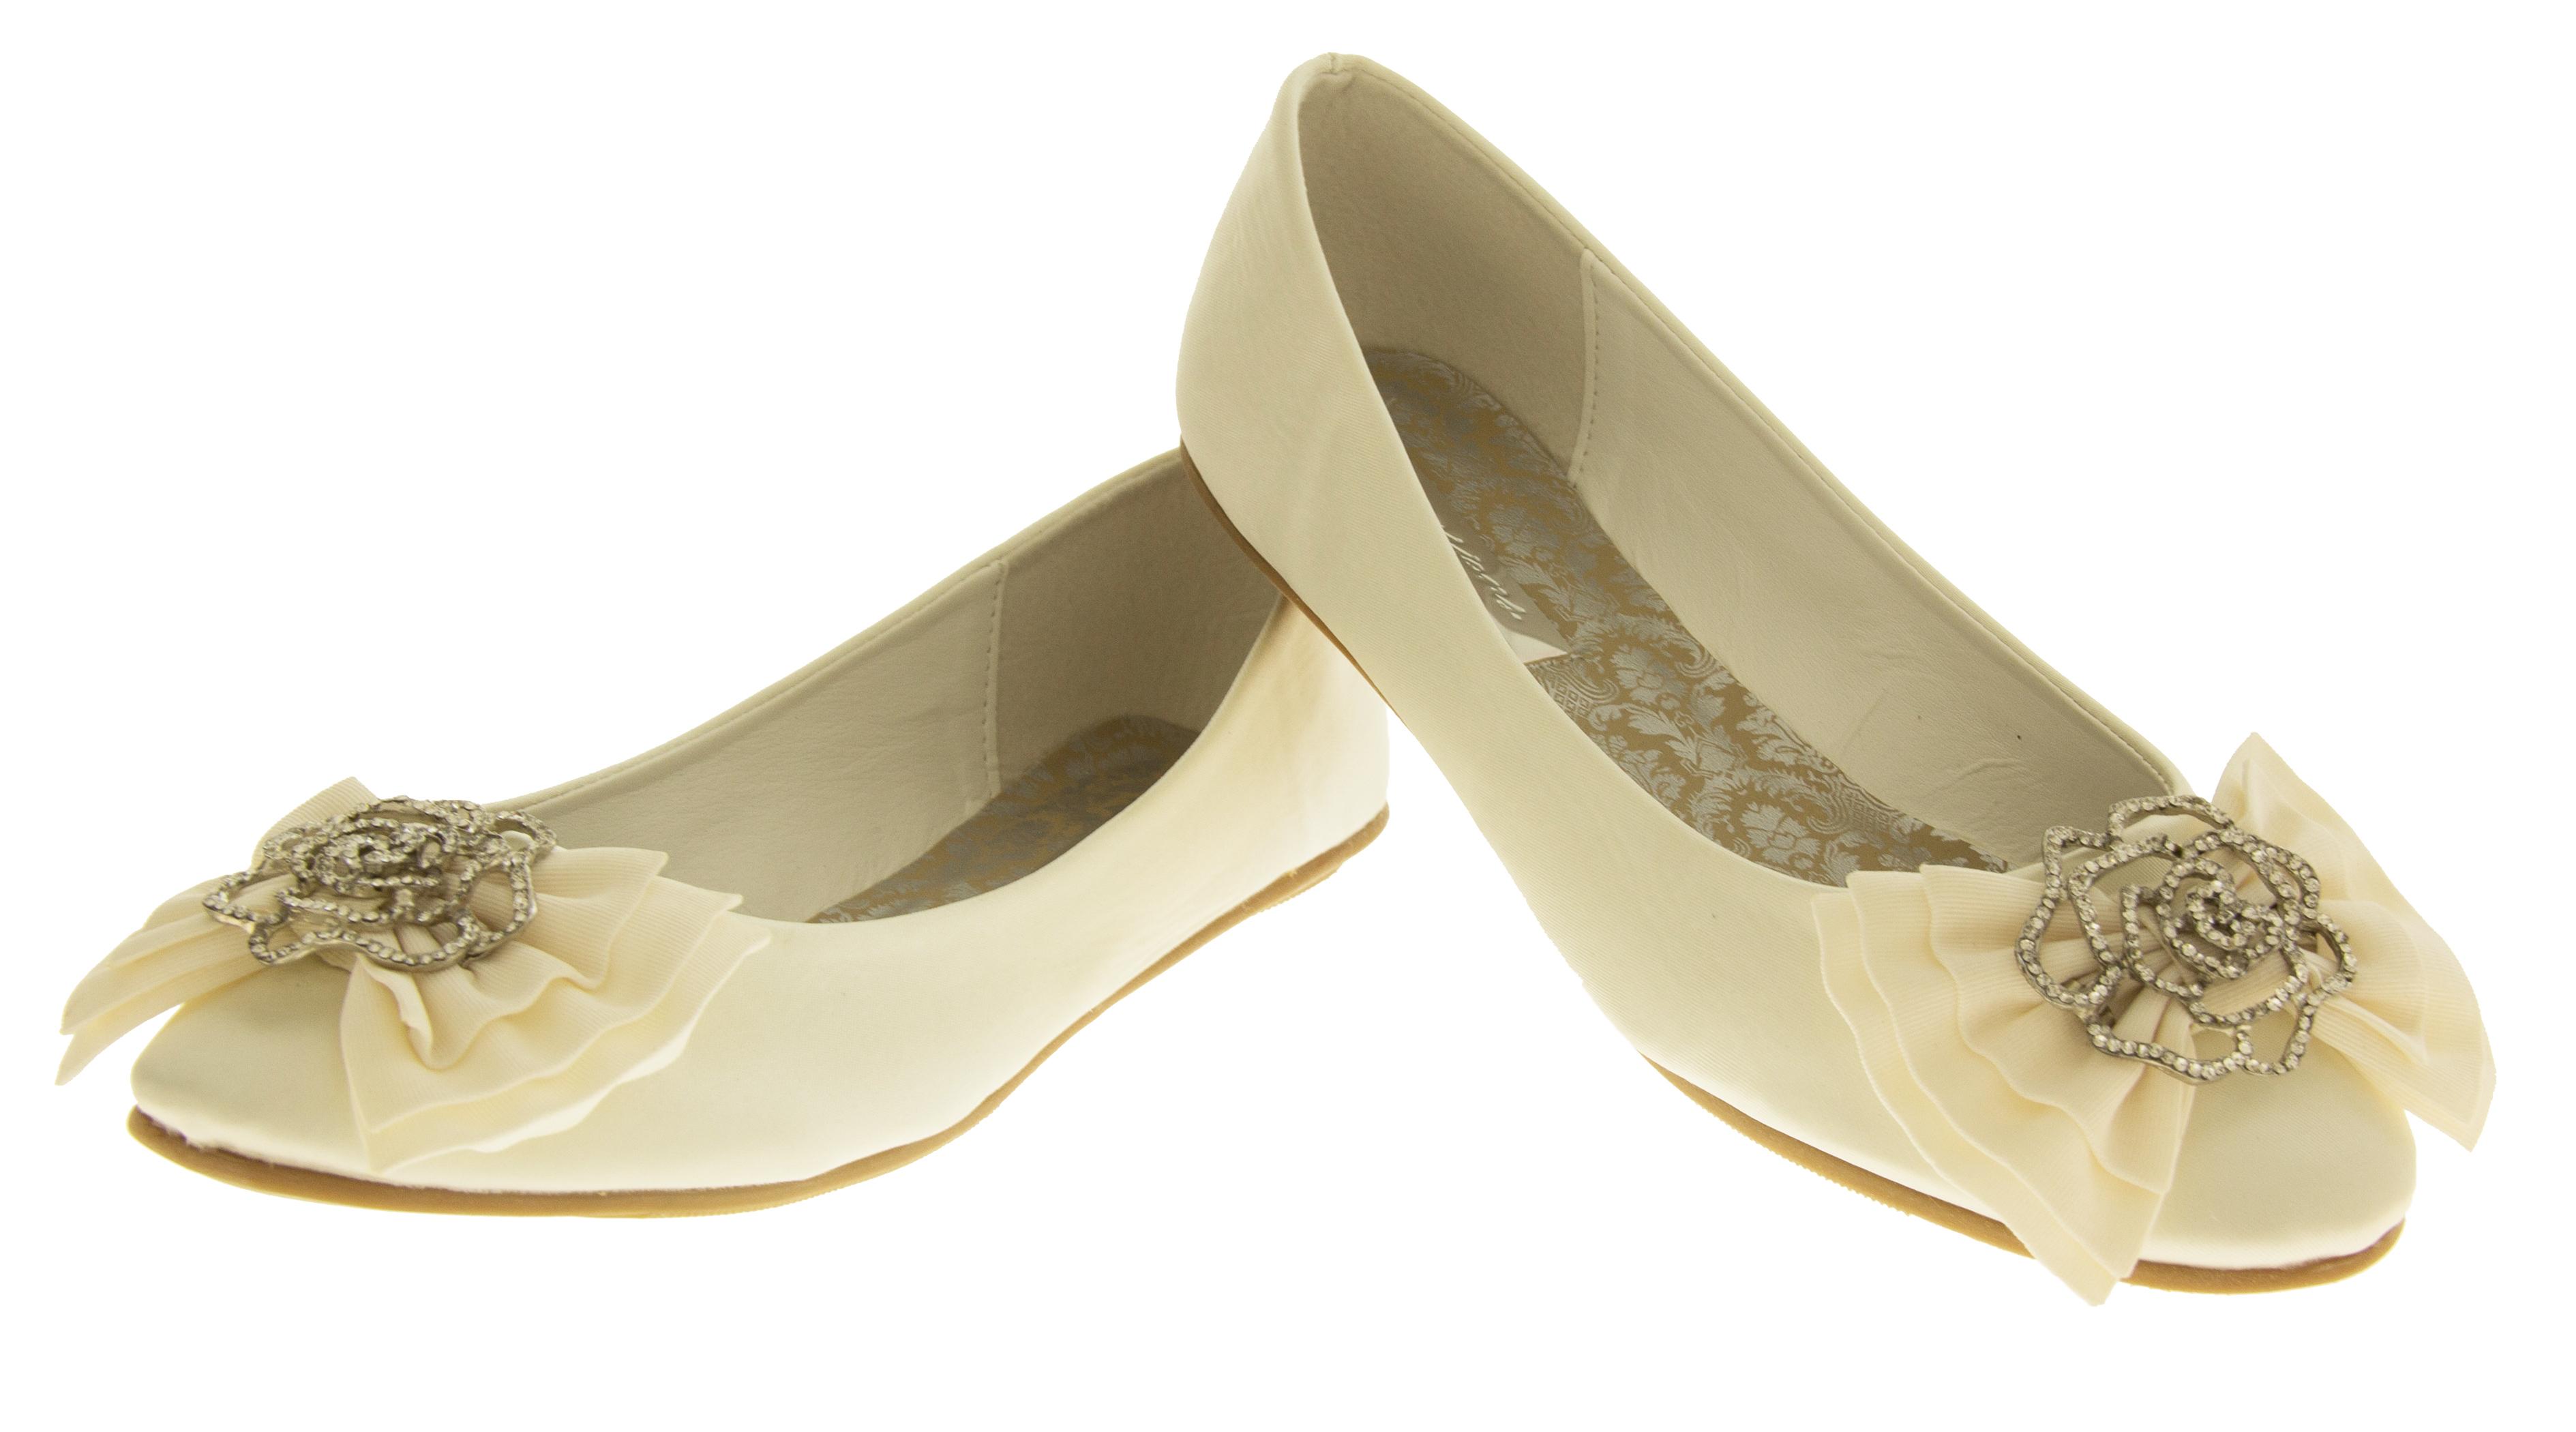 Ladies Ivory Dolly Shoes Flat Ballerina Bridal Pumps Bridesmaids Ballet Flats